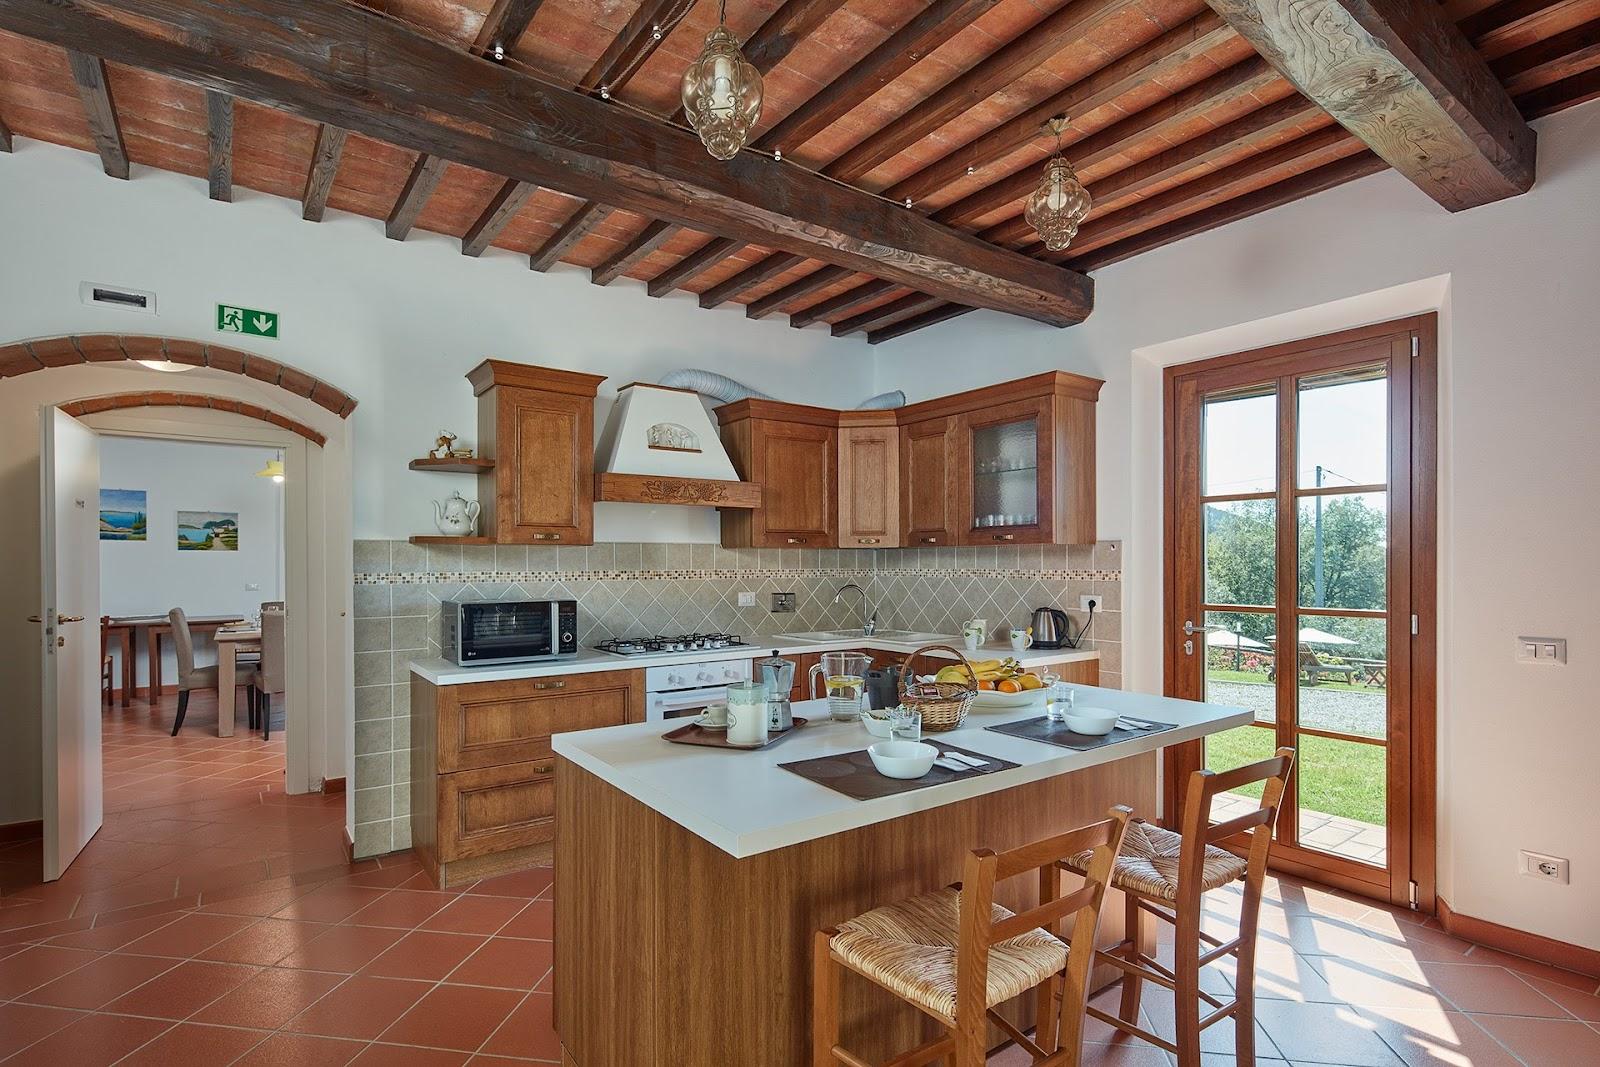 Ferienhaus Corte Paradiso (2570342), Monsummano Terme, Pistoia, Toskana, Italien, Bild 23